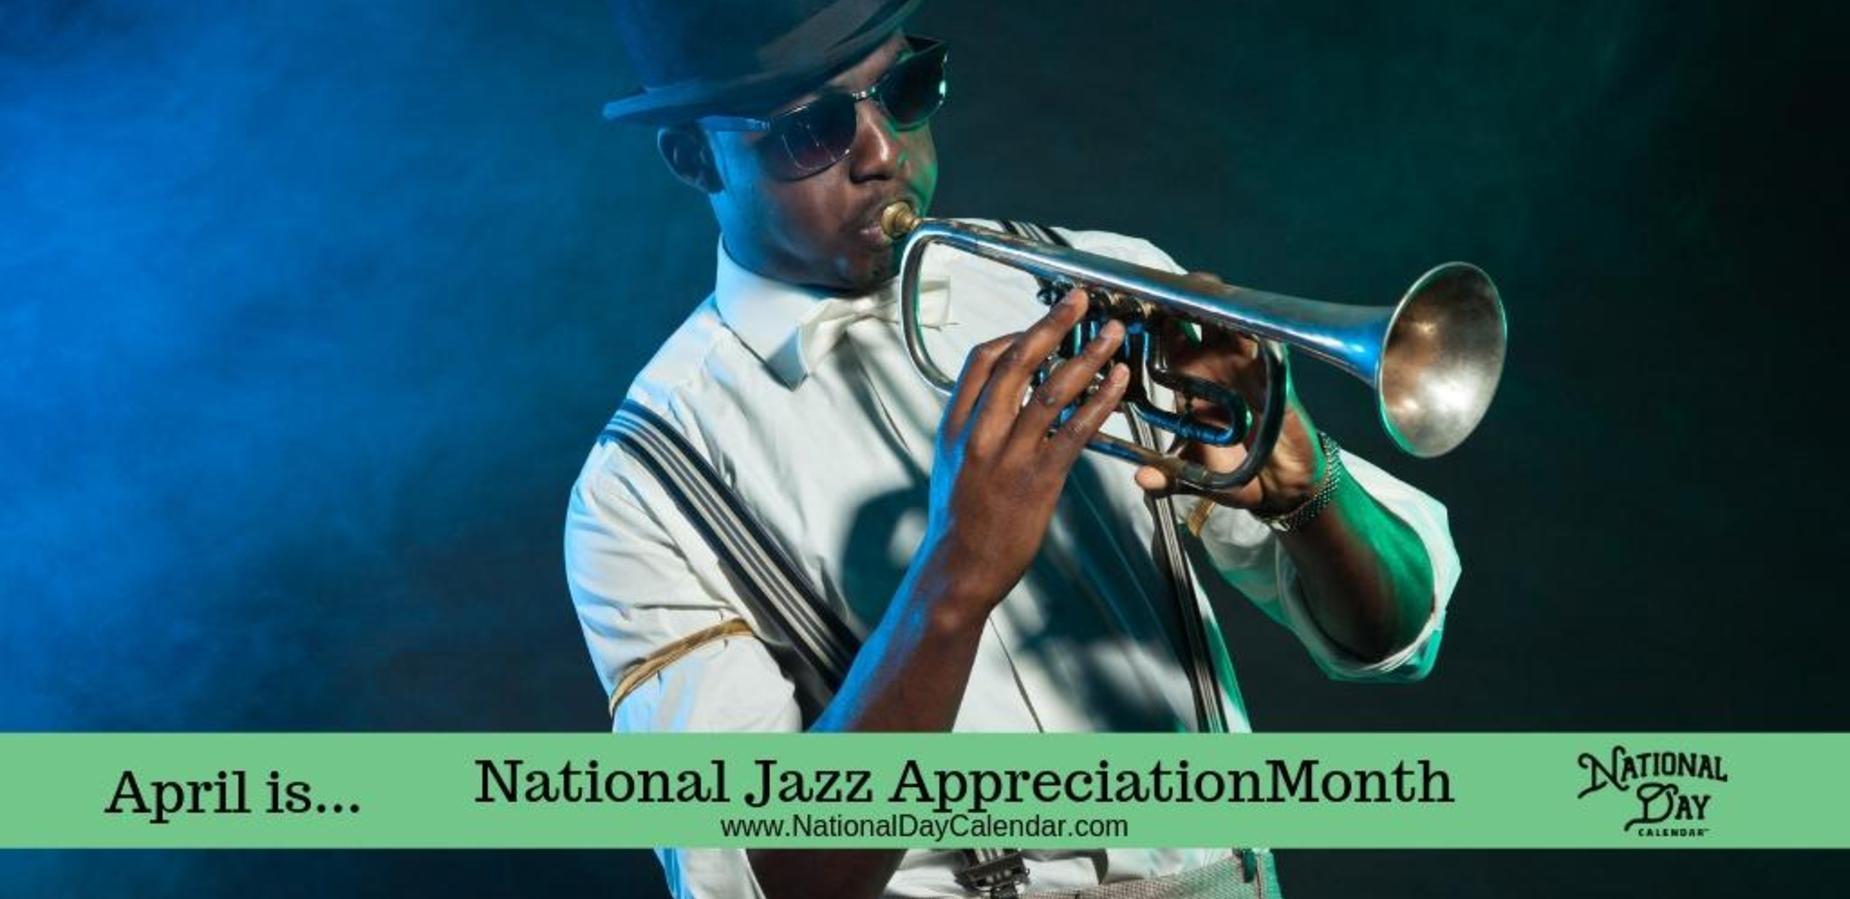 April is National Jazz Appreciation Month